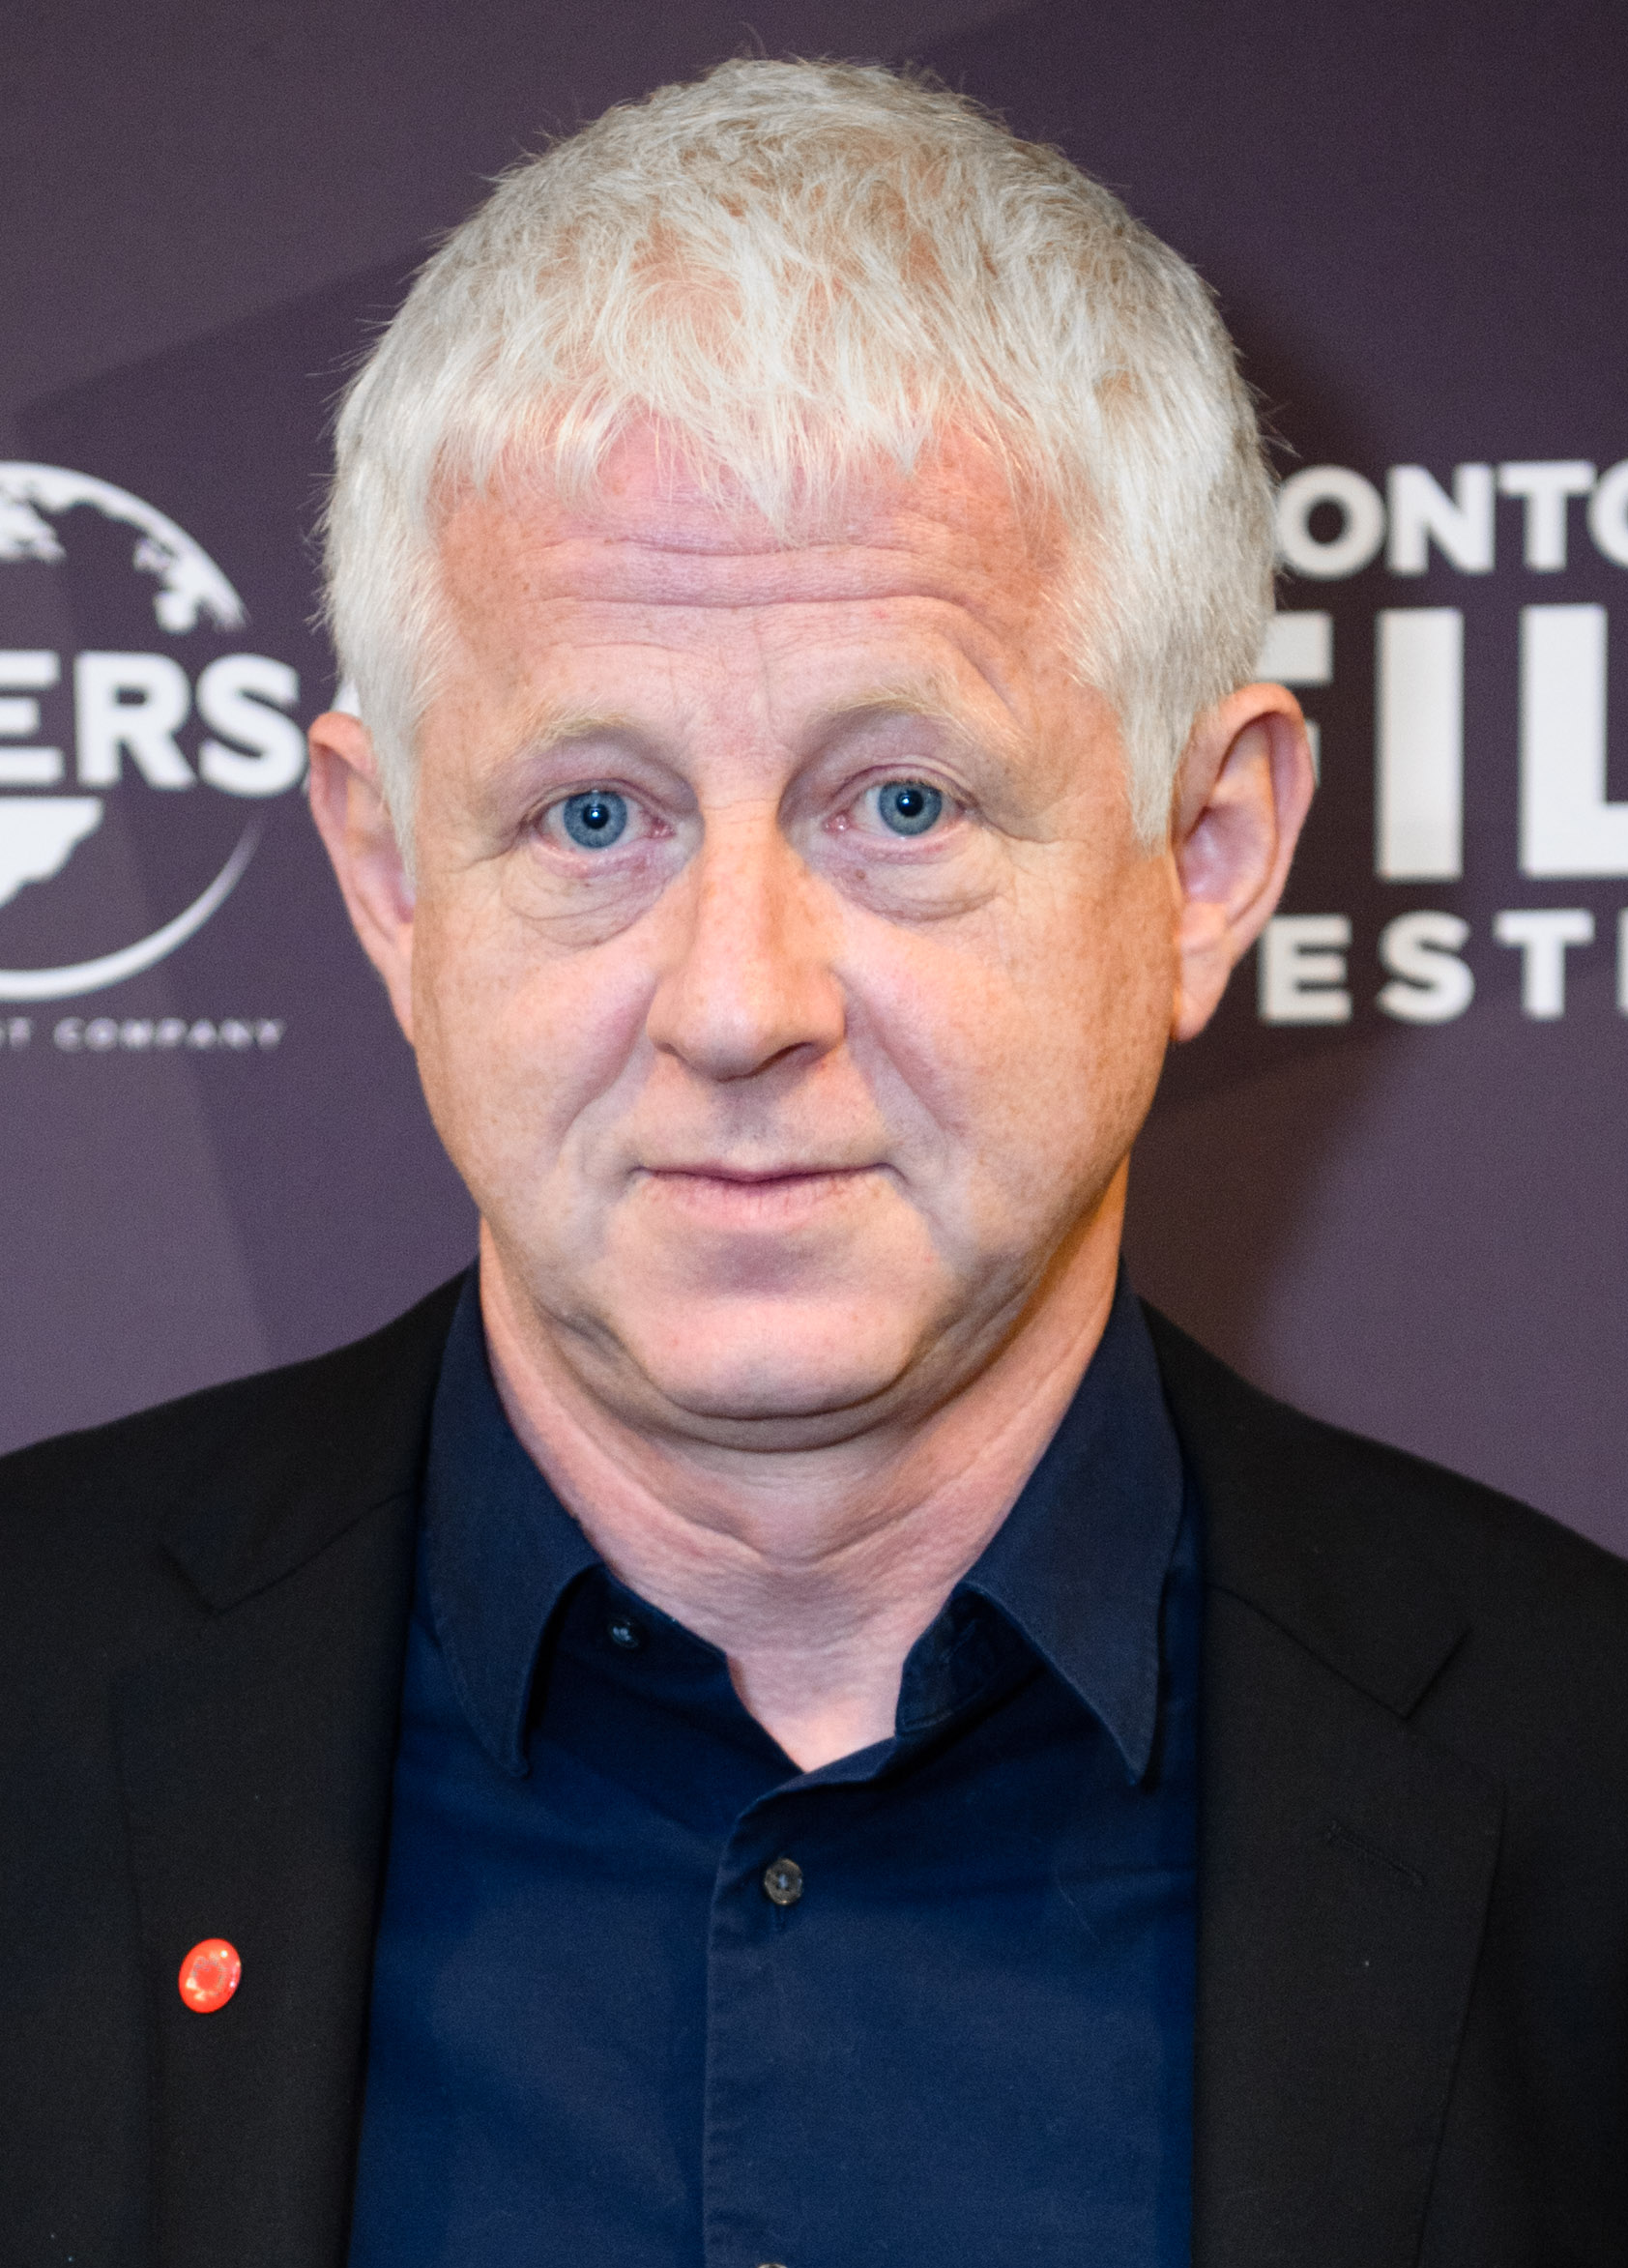 picture Tim McInnerny (born 1956)